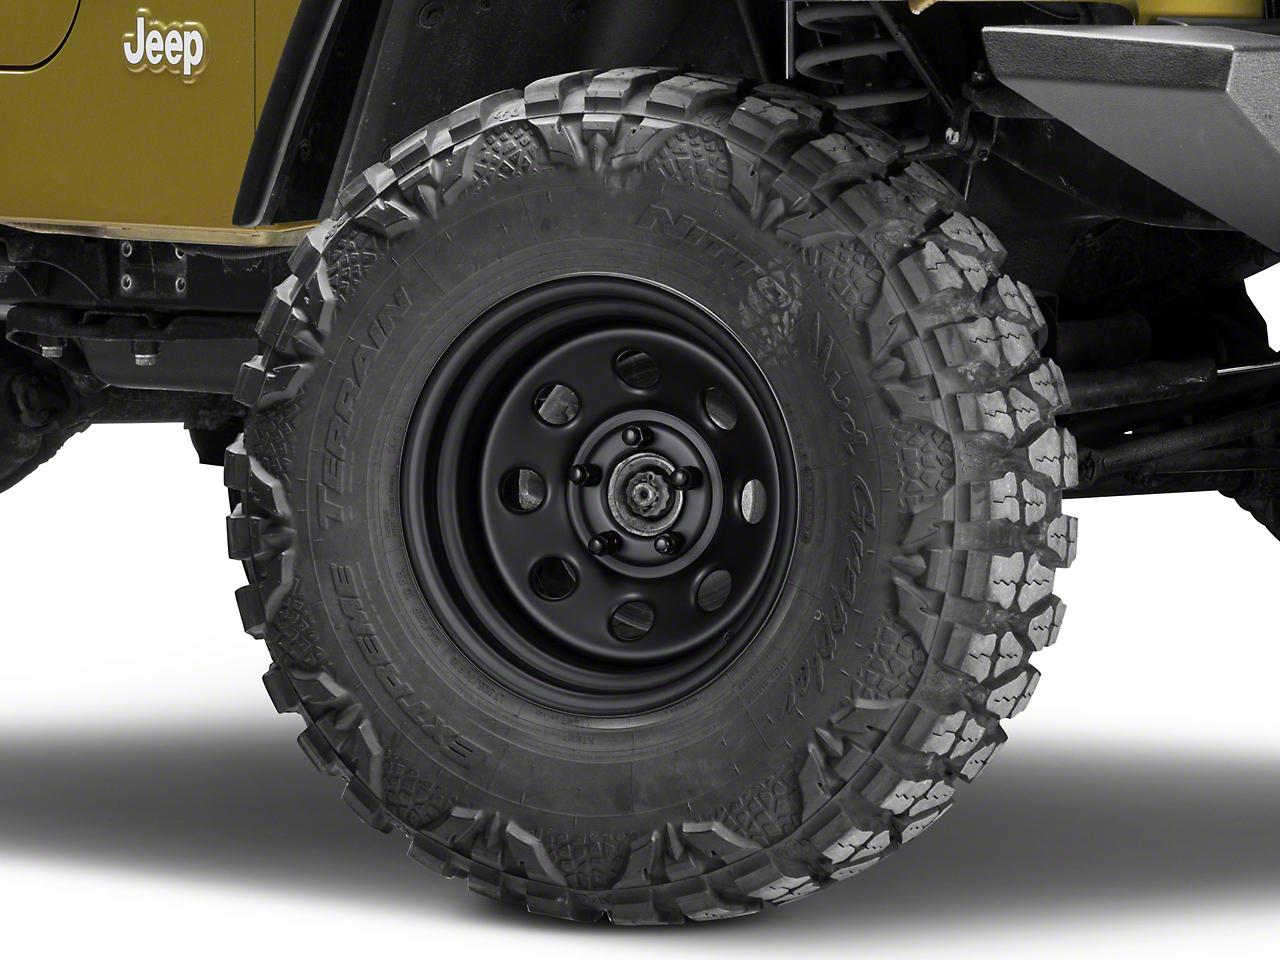 Pro Comp Steel Series 97 Rock Crawler Flat Black Wheel - 15x8 (87-06 Wrangler YJ & TJ)